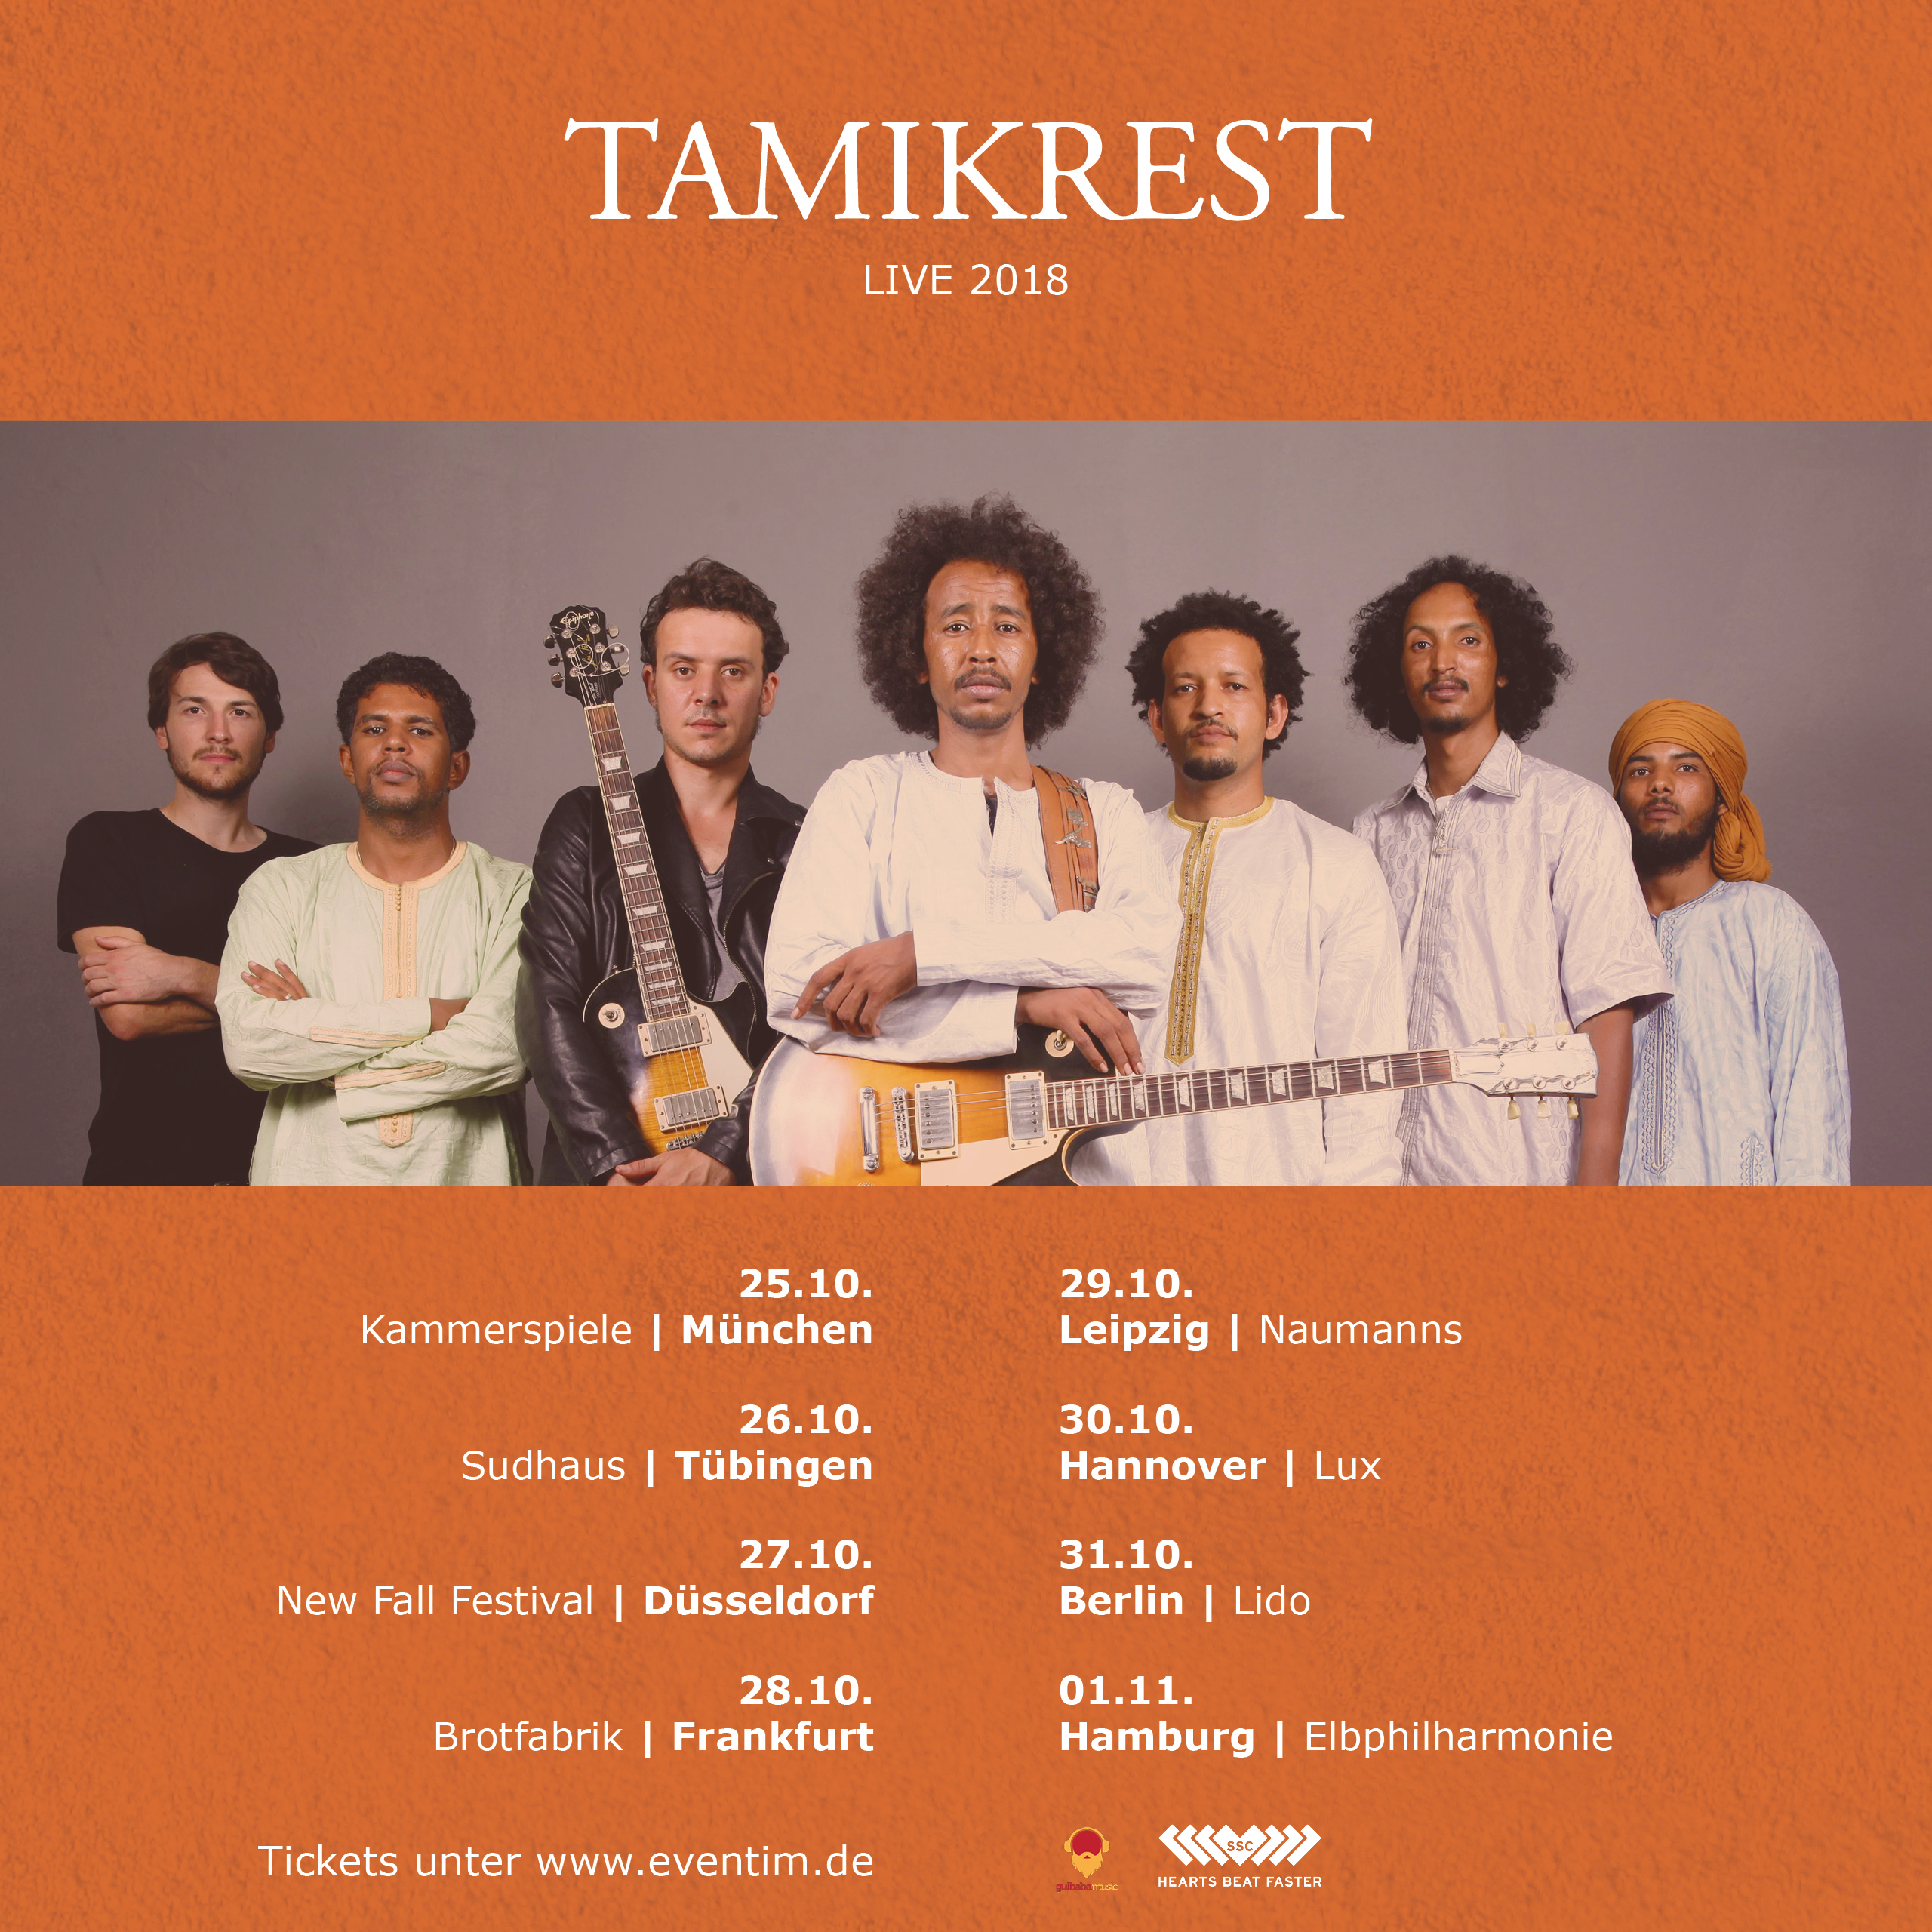 Tamikrest Tour 2018